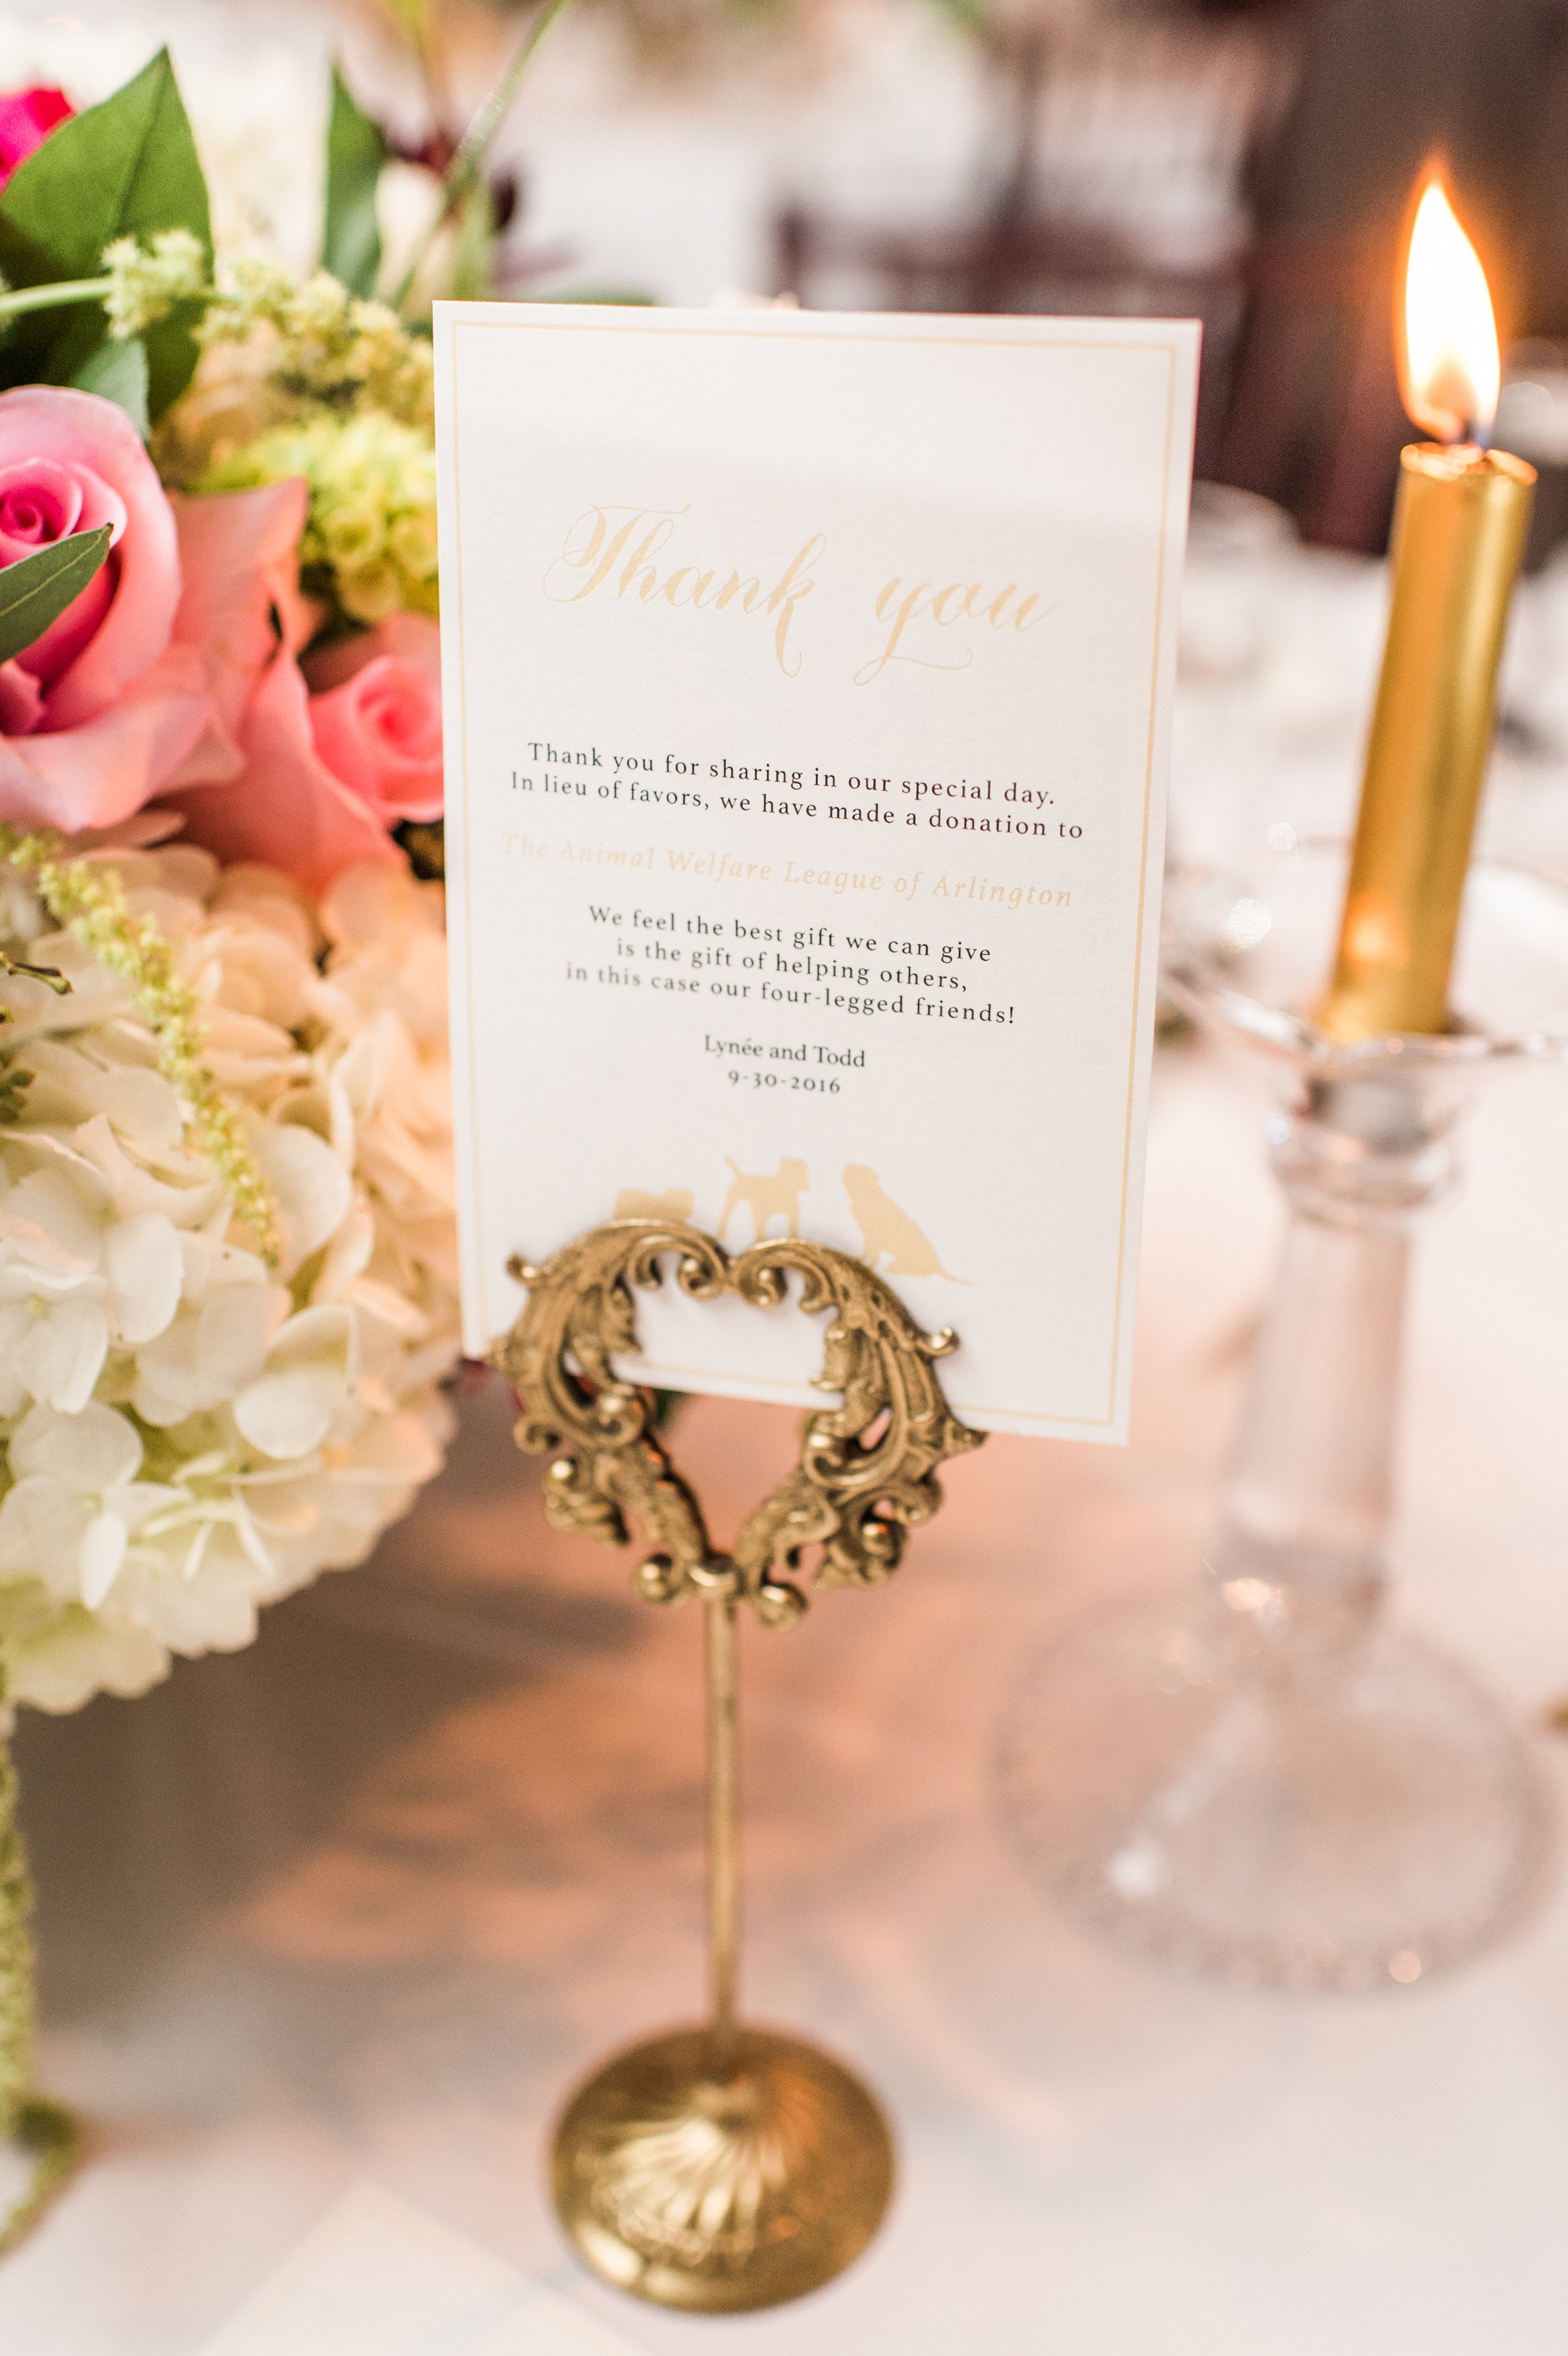 wedding-favor-ideas-third-clover-paper-stephanie-messick-photography.jpg